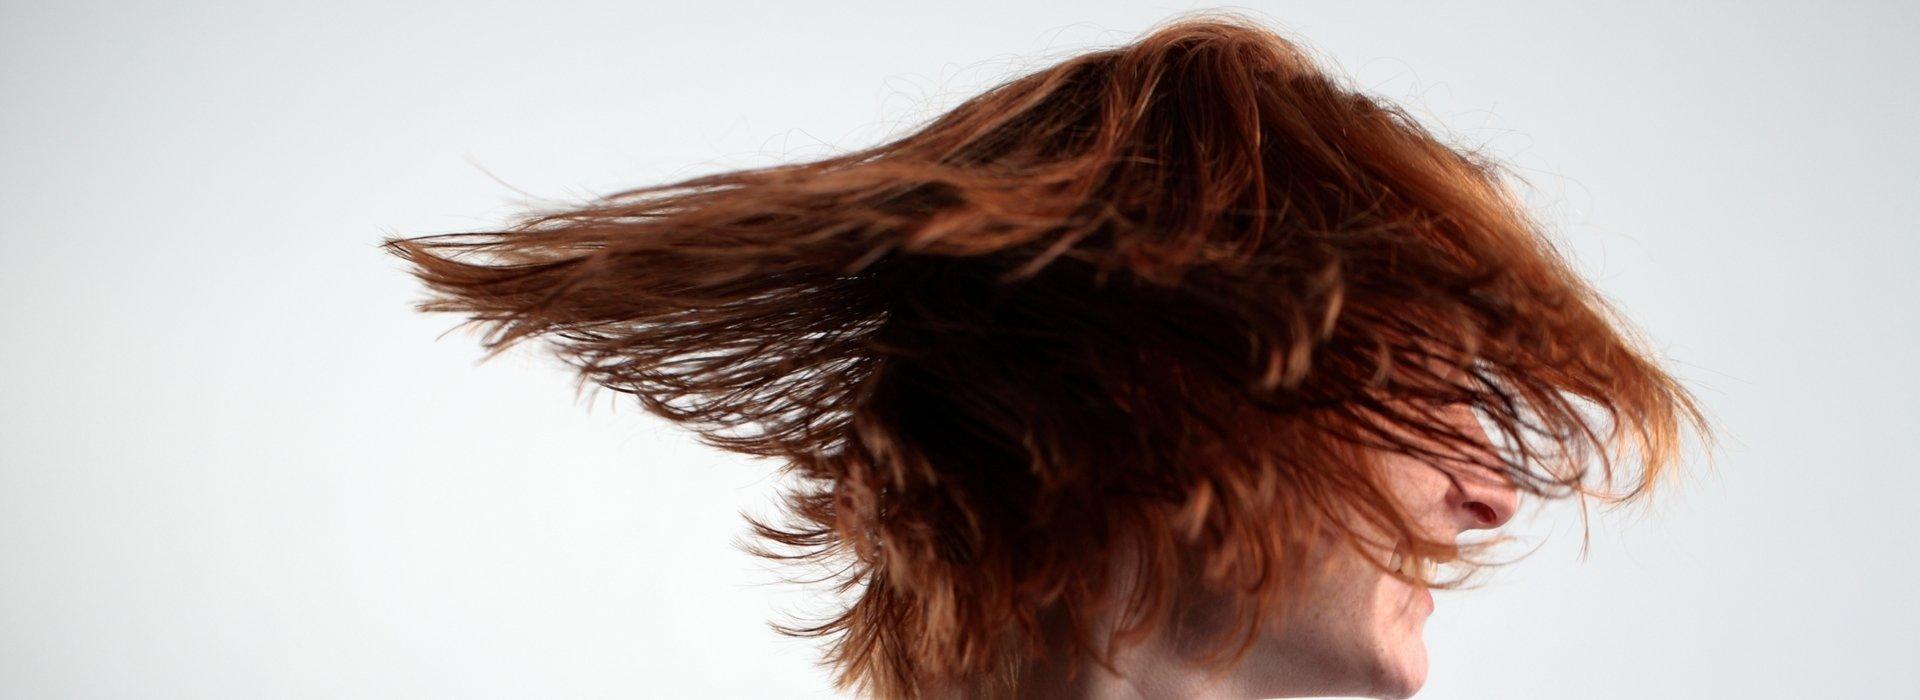 Haartransplantation in Budapest – Günstige Haartransplantation Budapest